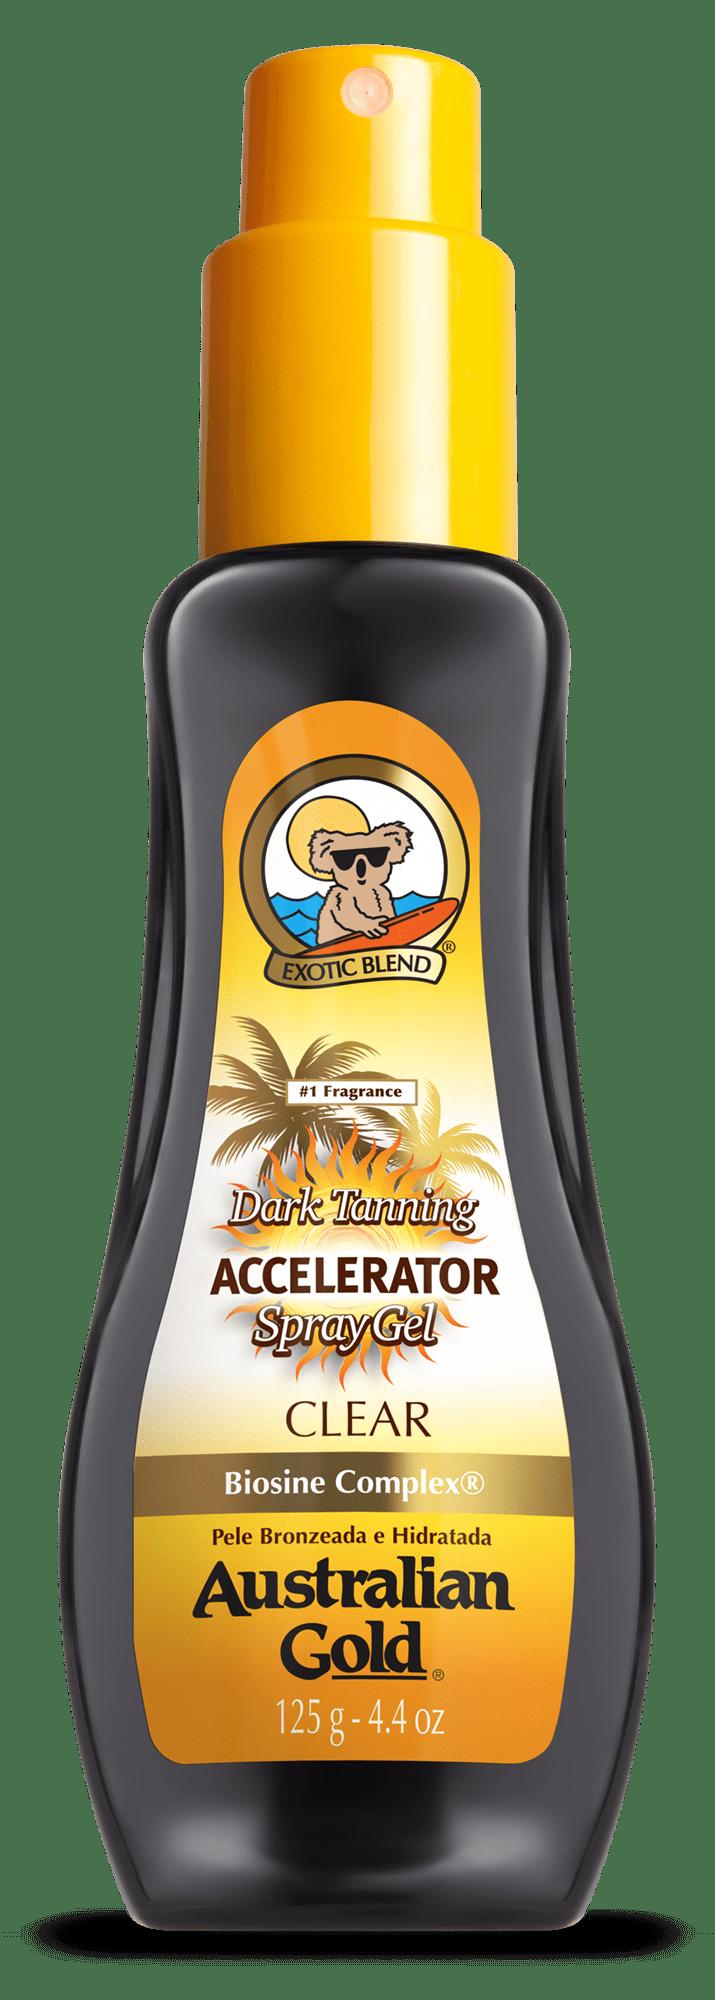 Australian Gold Dark Tanning Accelerator Clear Spray Gel Acelerador de Bronzeado 125gr